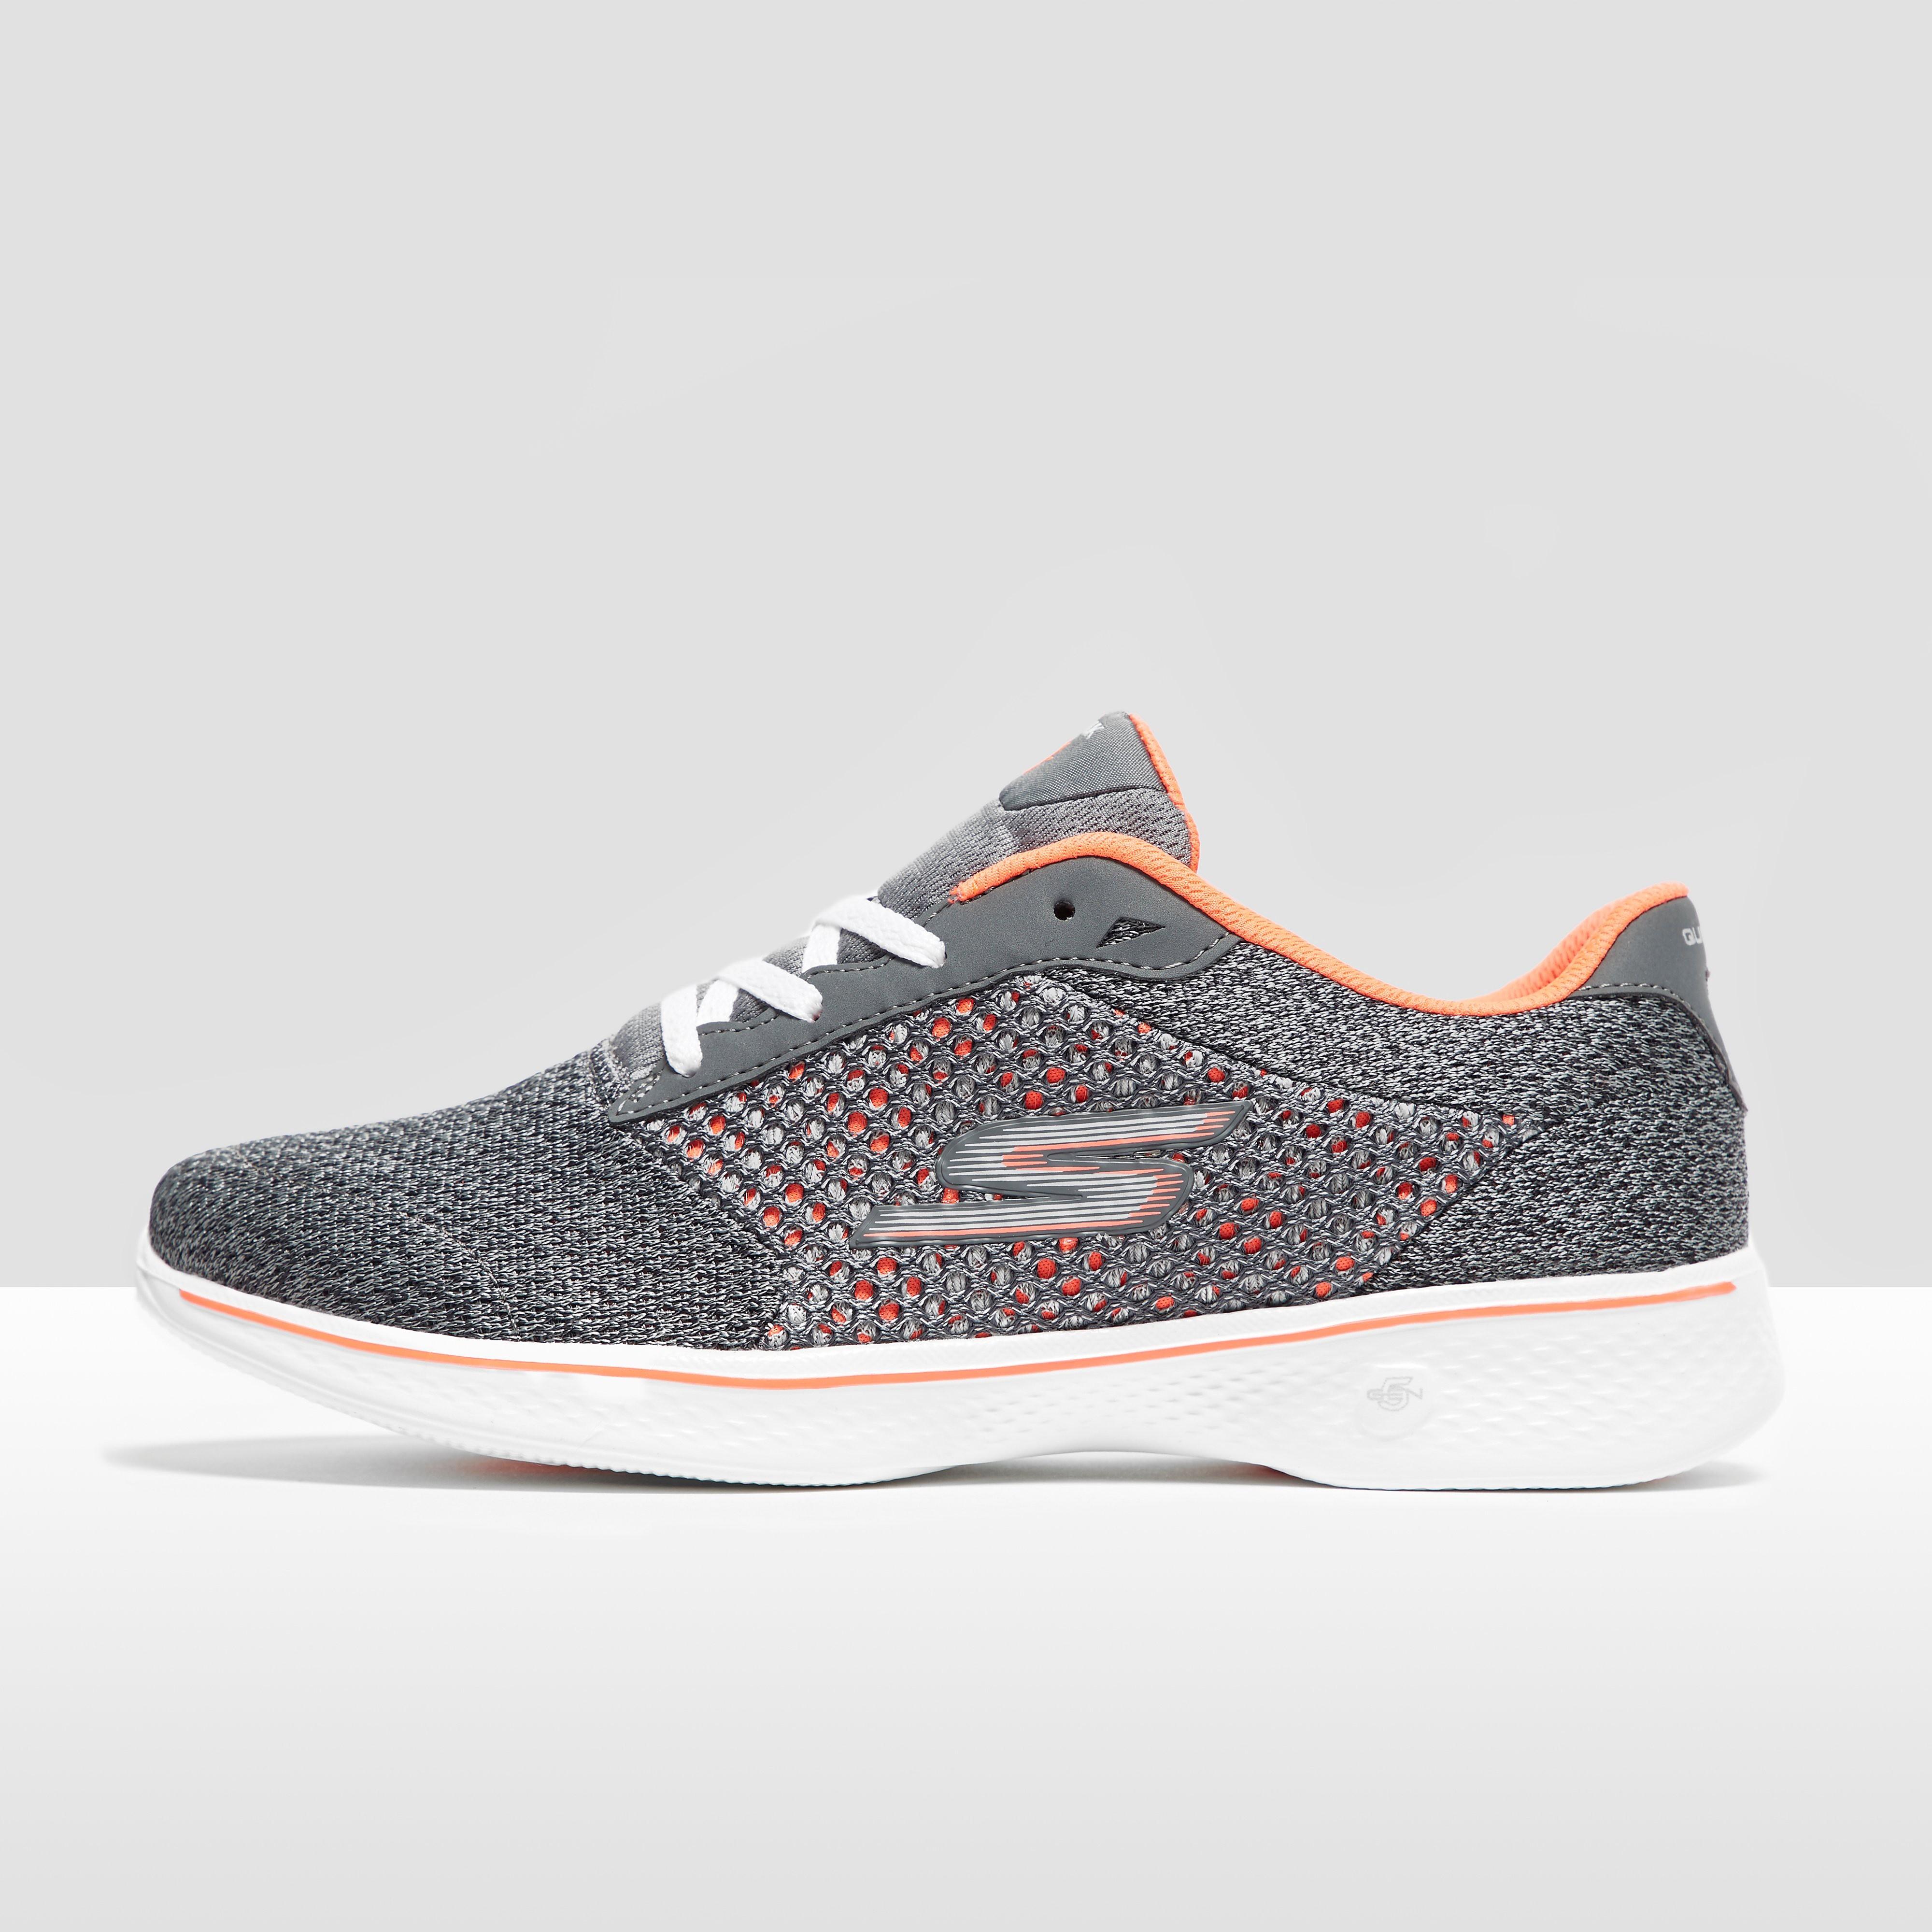 Skechers GOwalk 4- Exceed Women's Casual Shoes